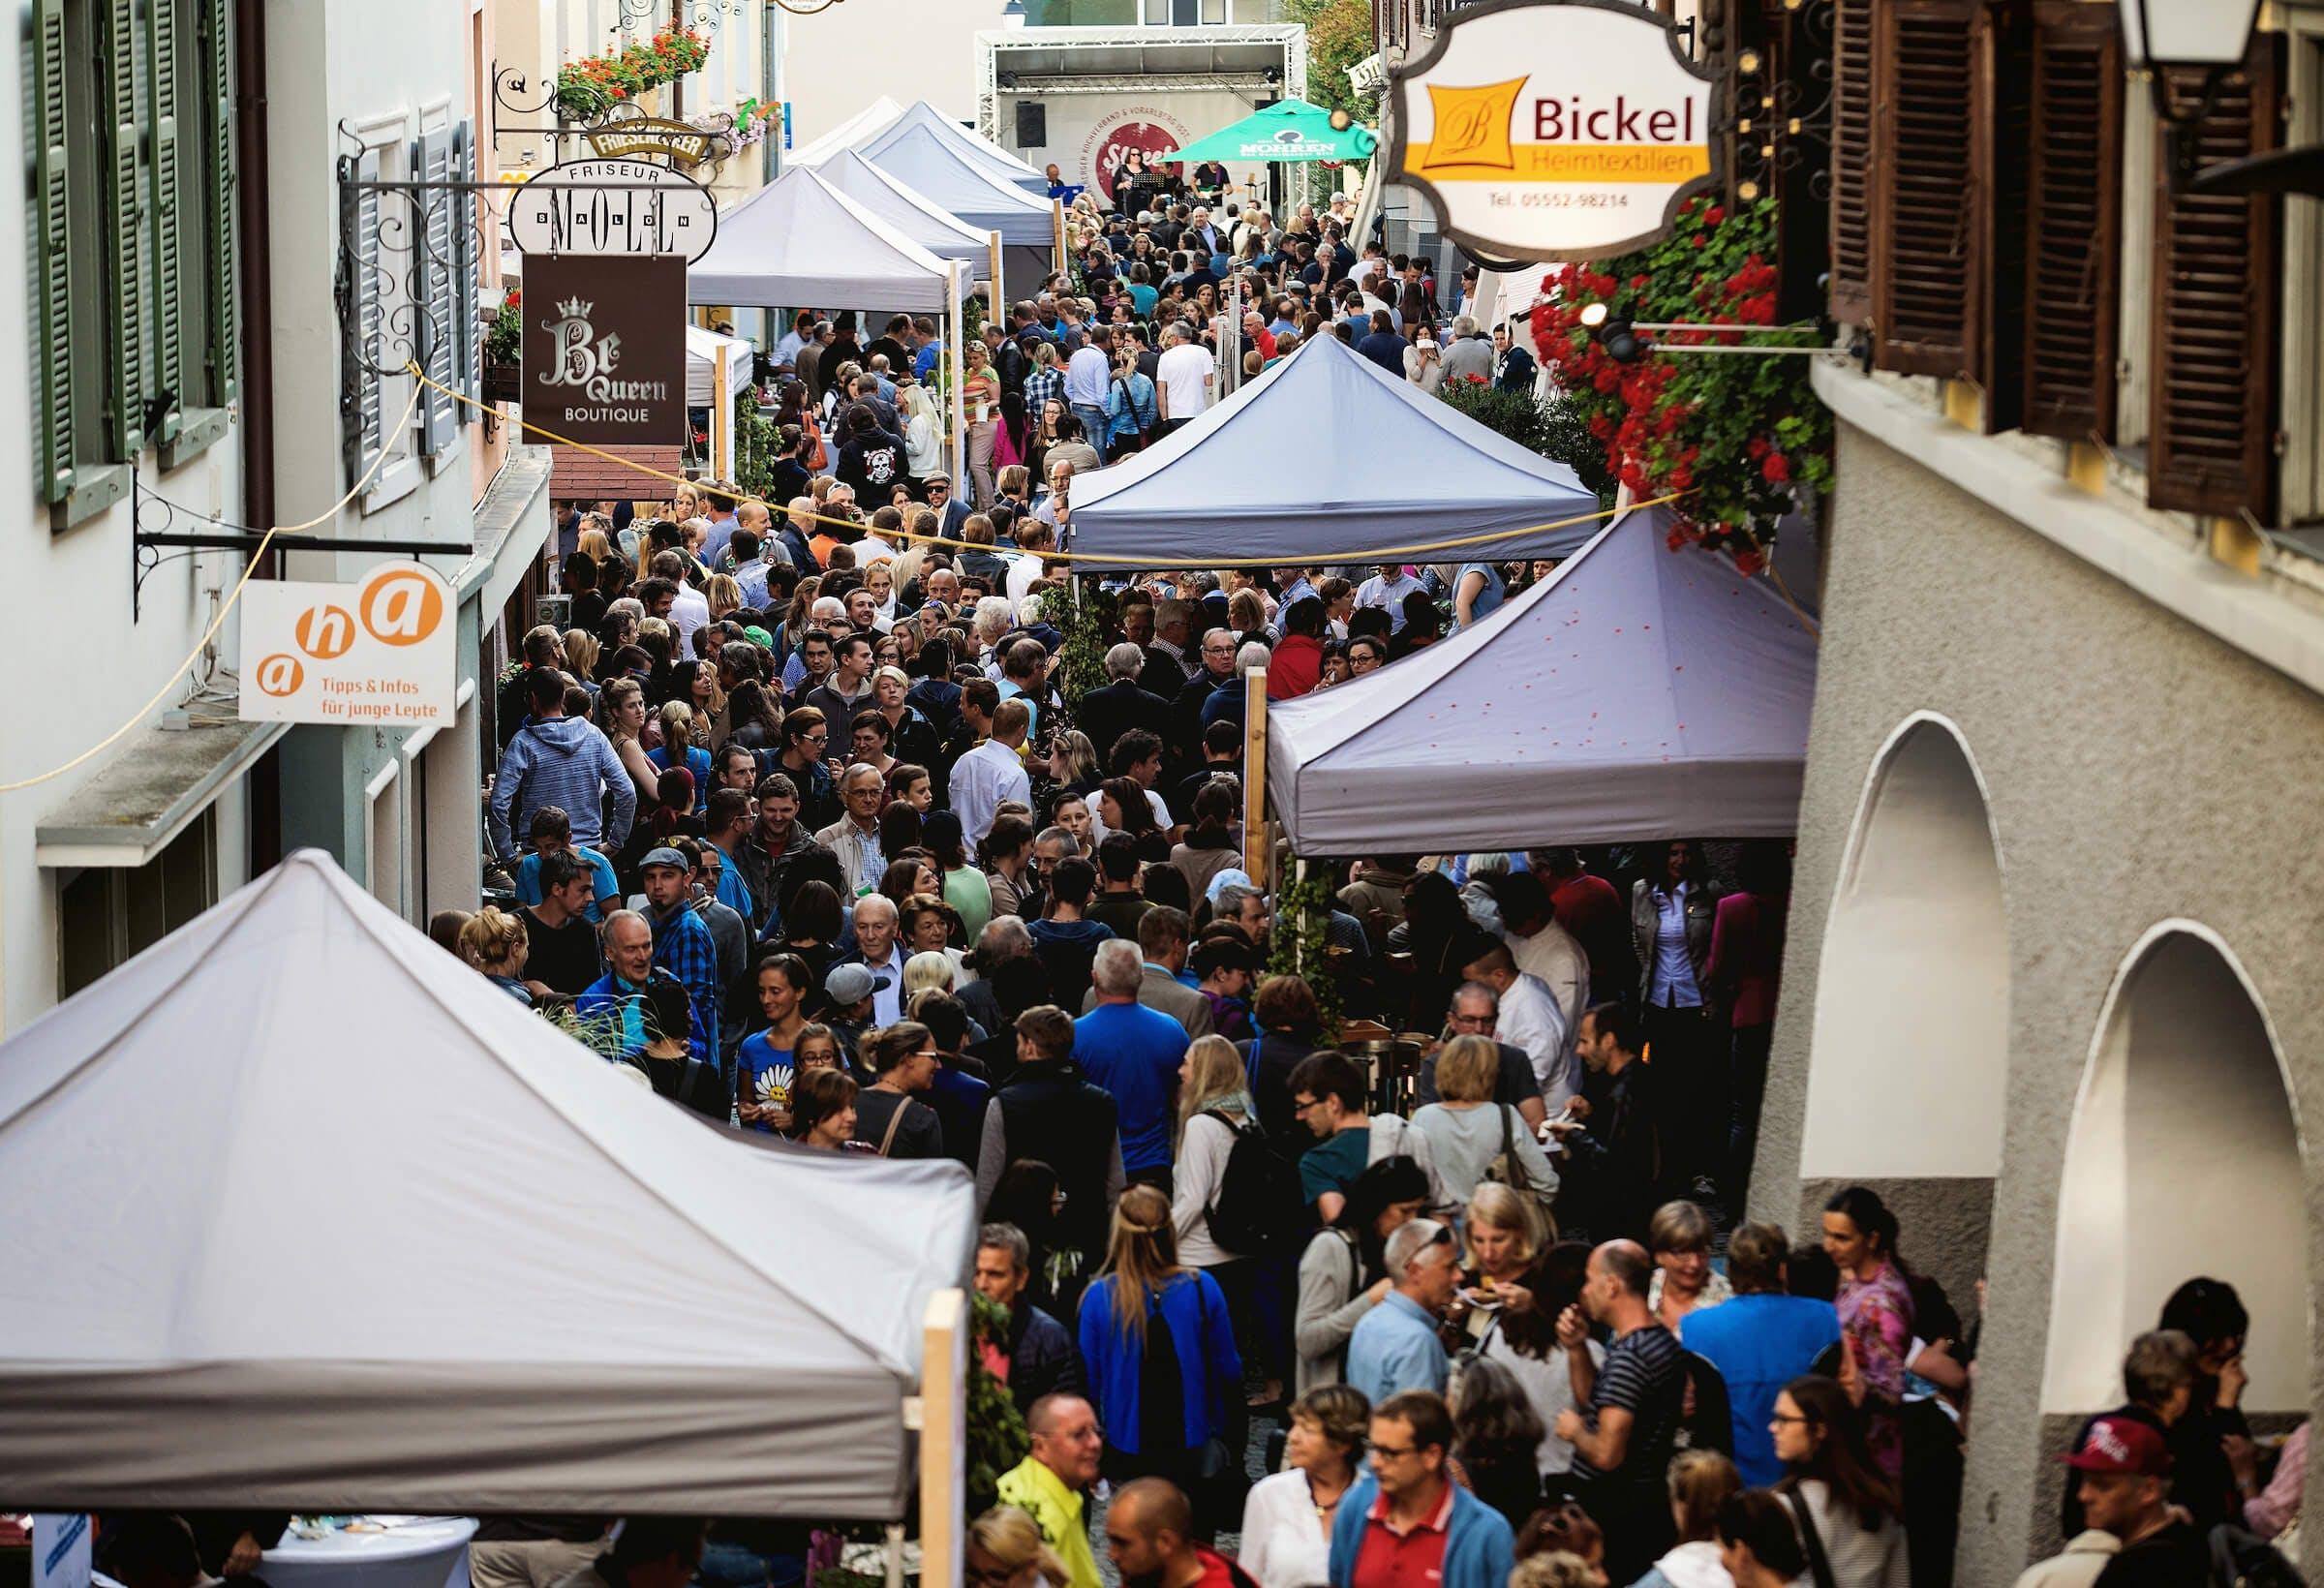 Menschenmenge am Streetfood Festival